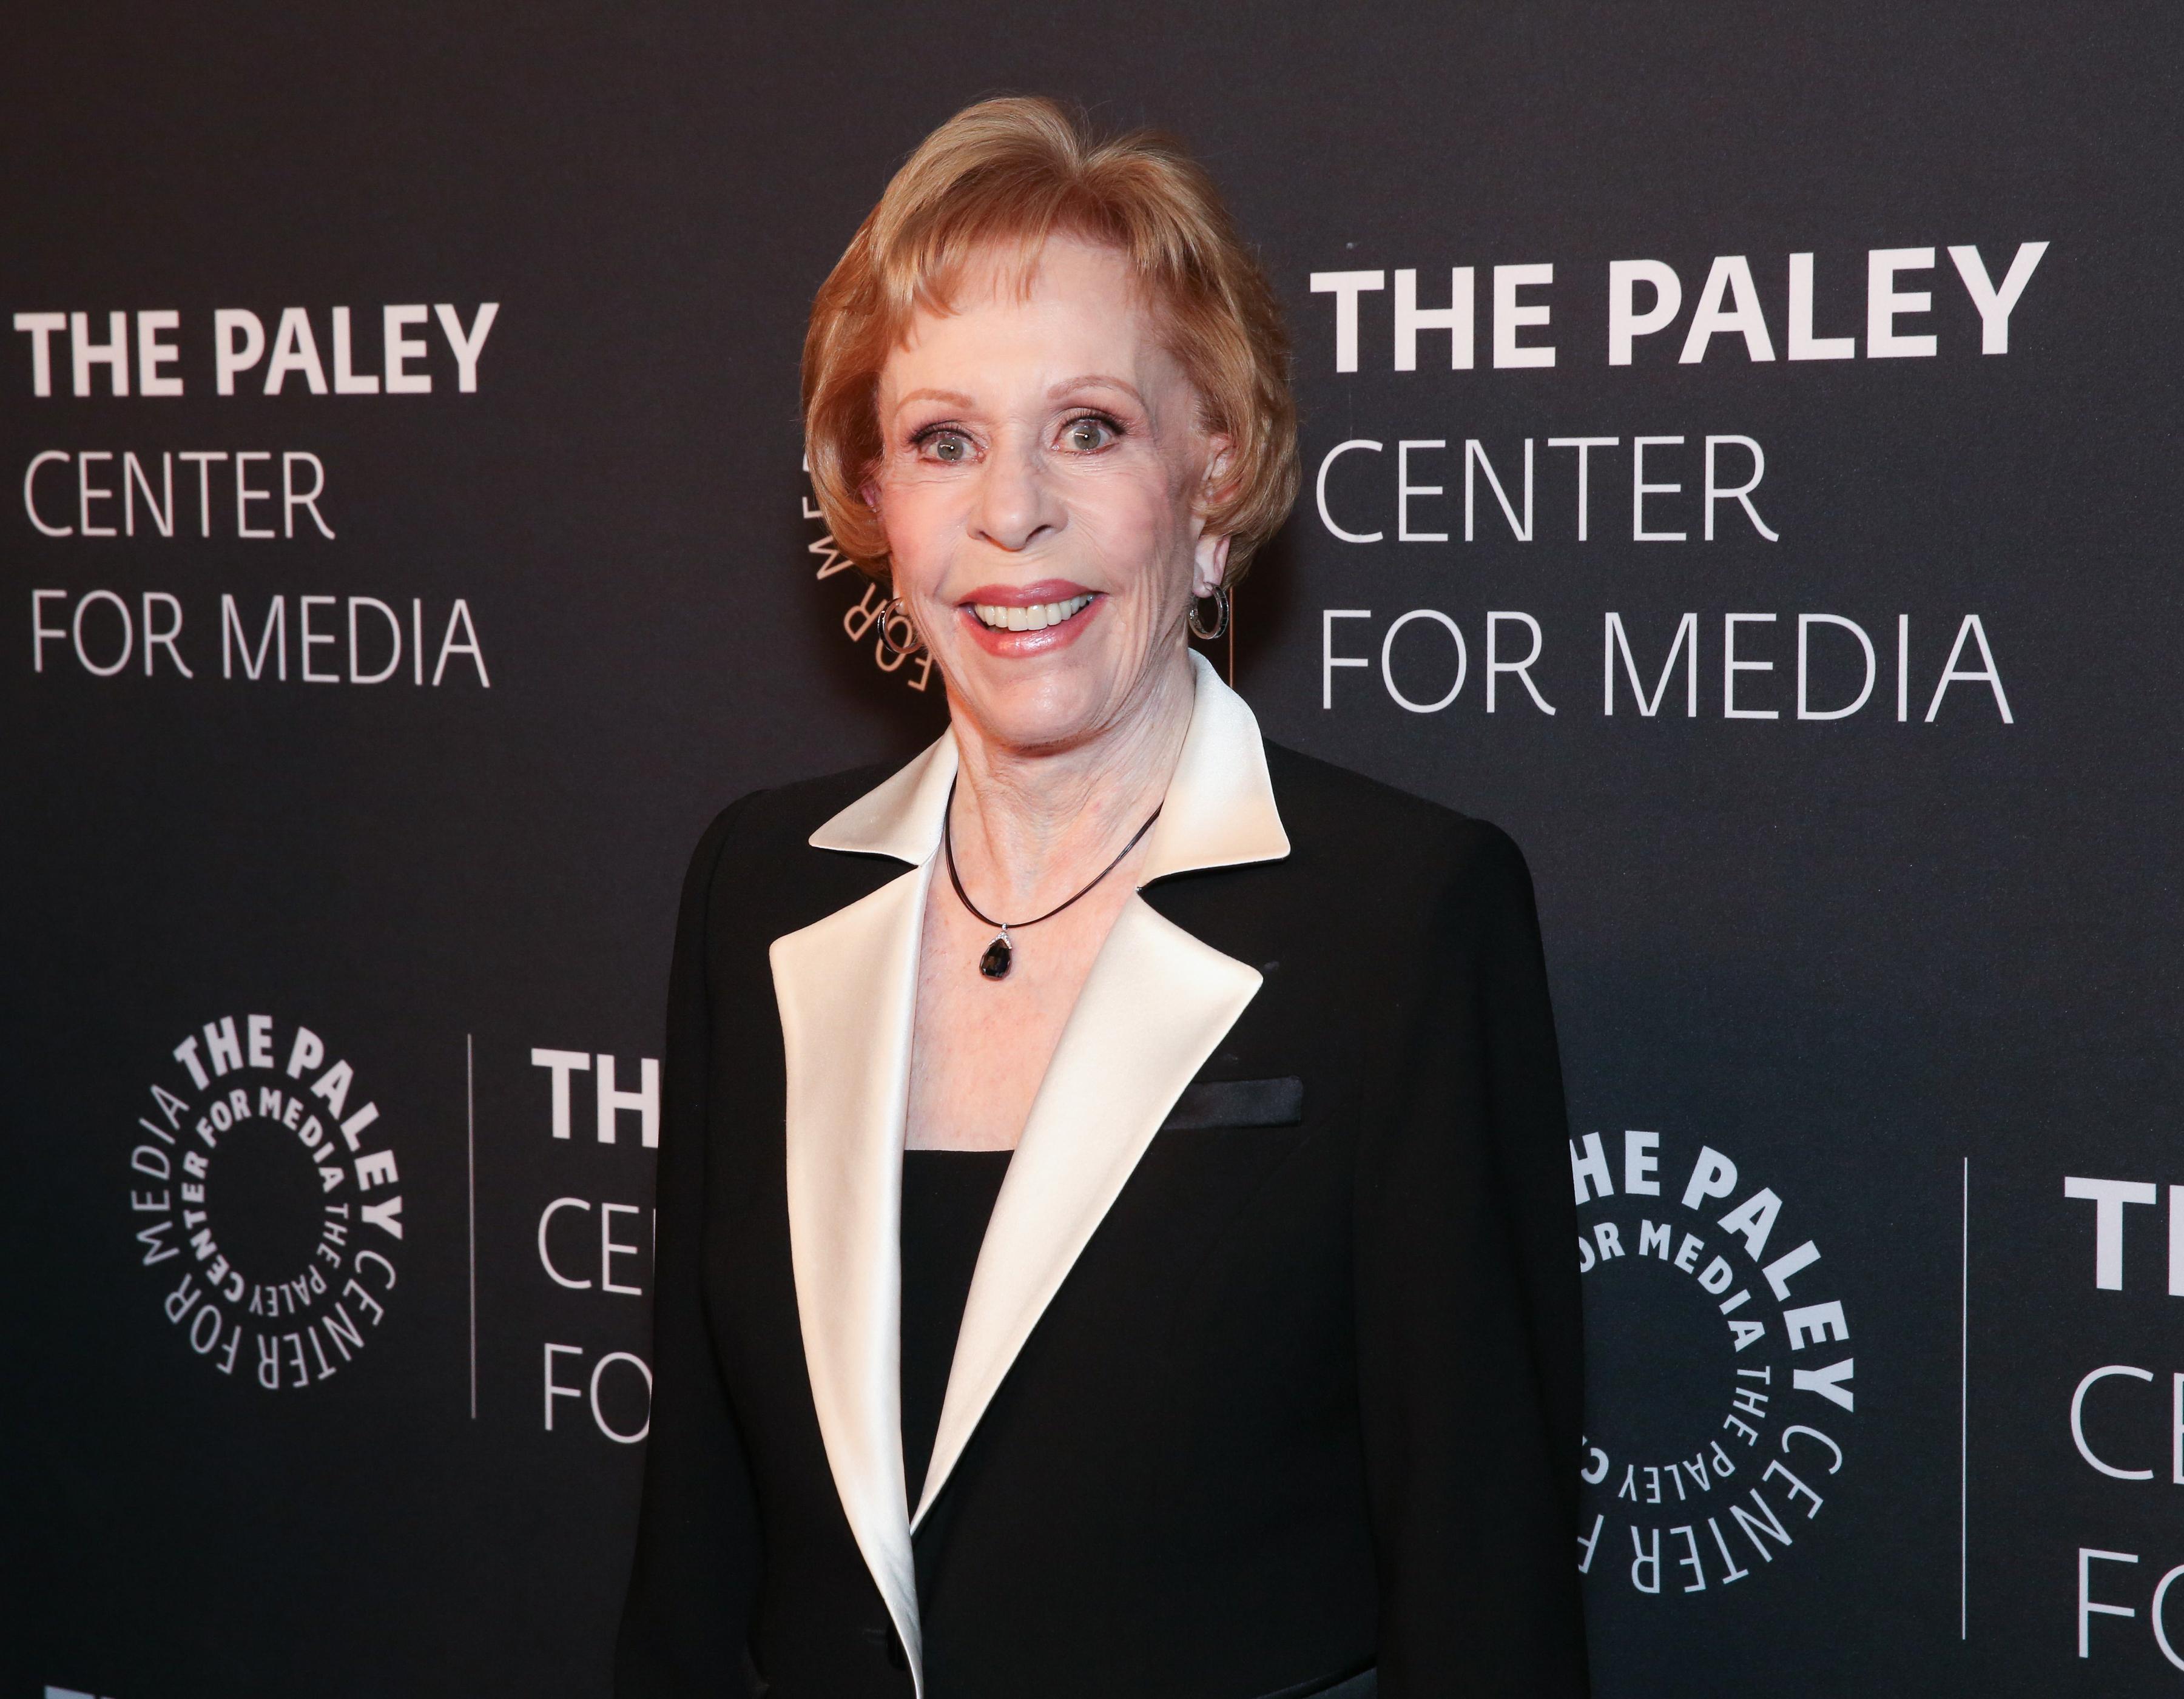 Carol Burnett Broke Down Comedy Barriers For Women That TV Is Determined to Rebuild